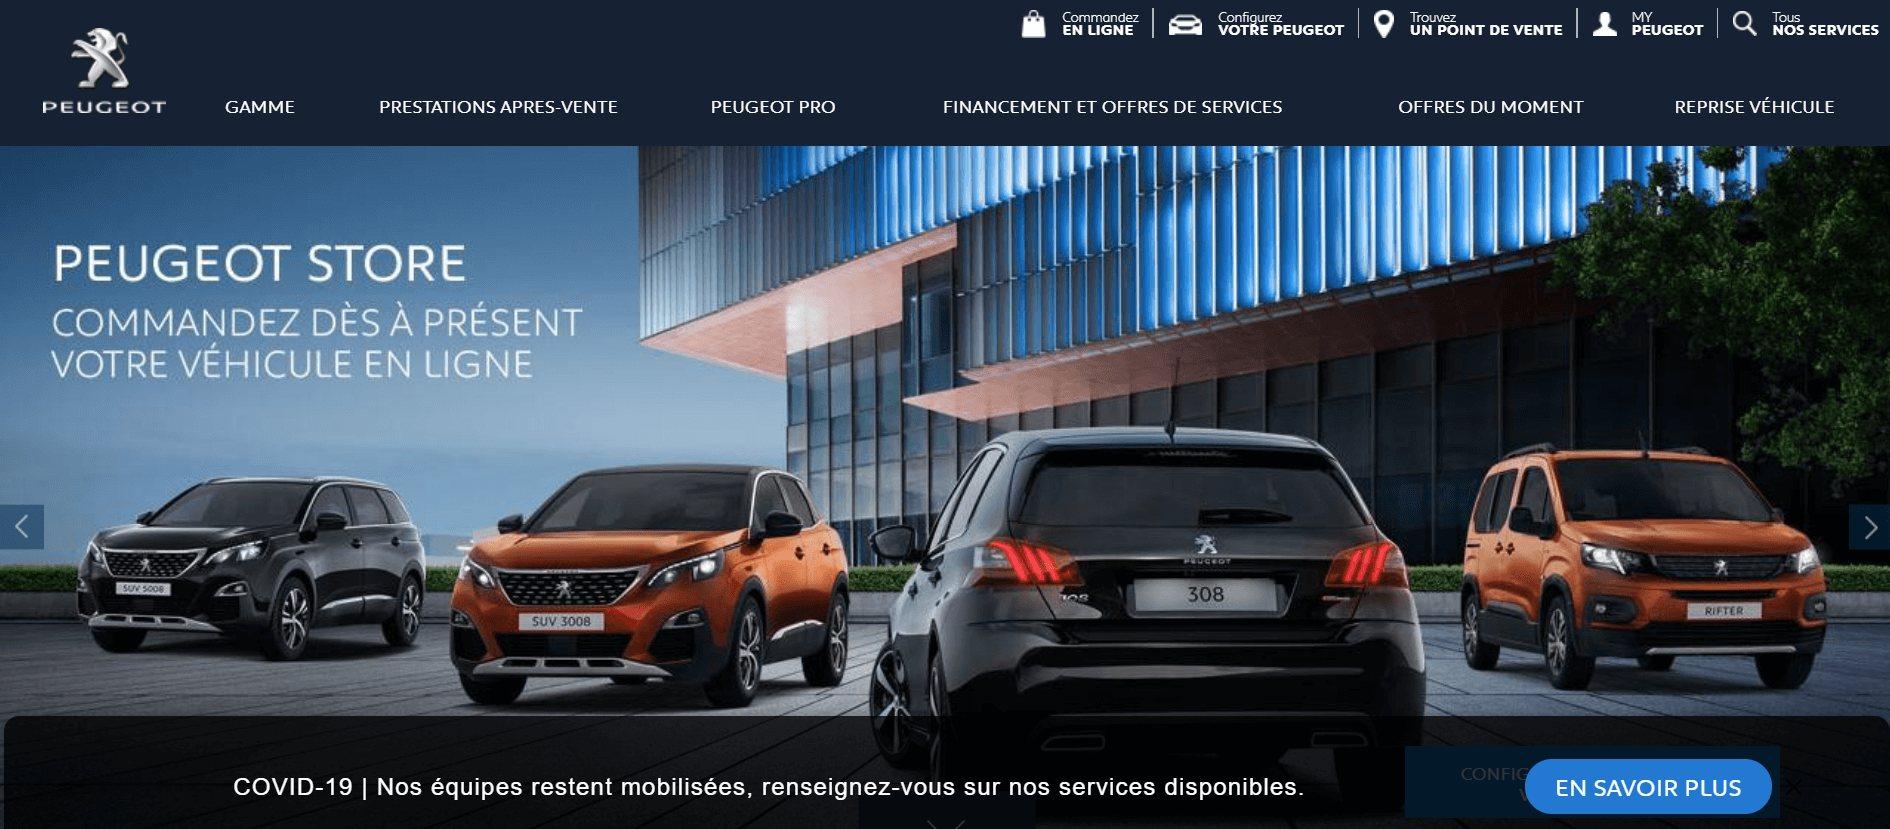 Peugeot Banner